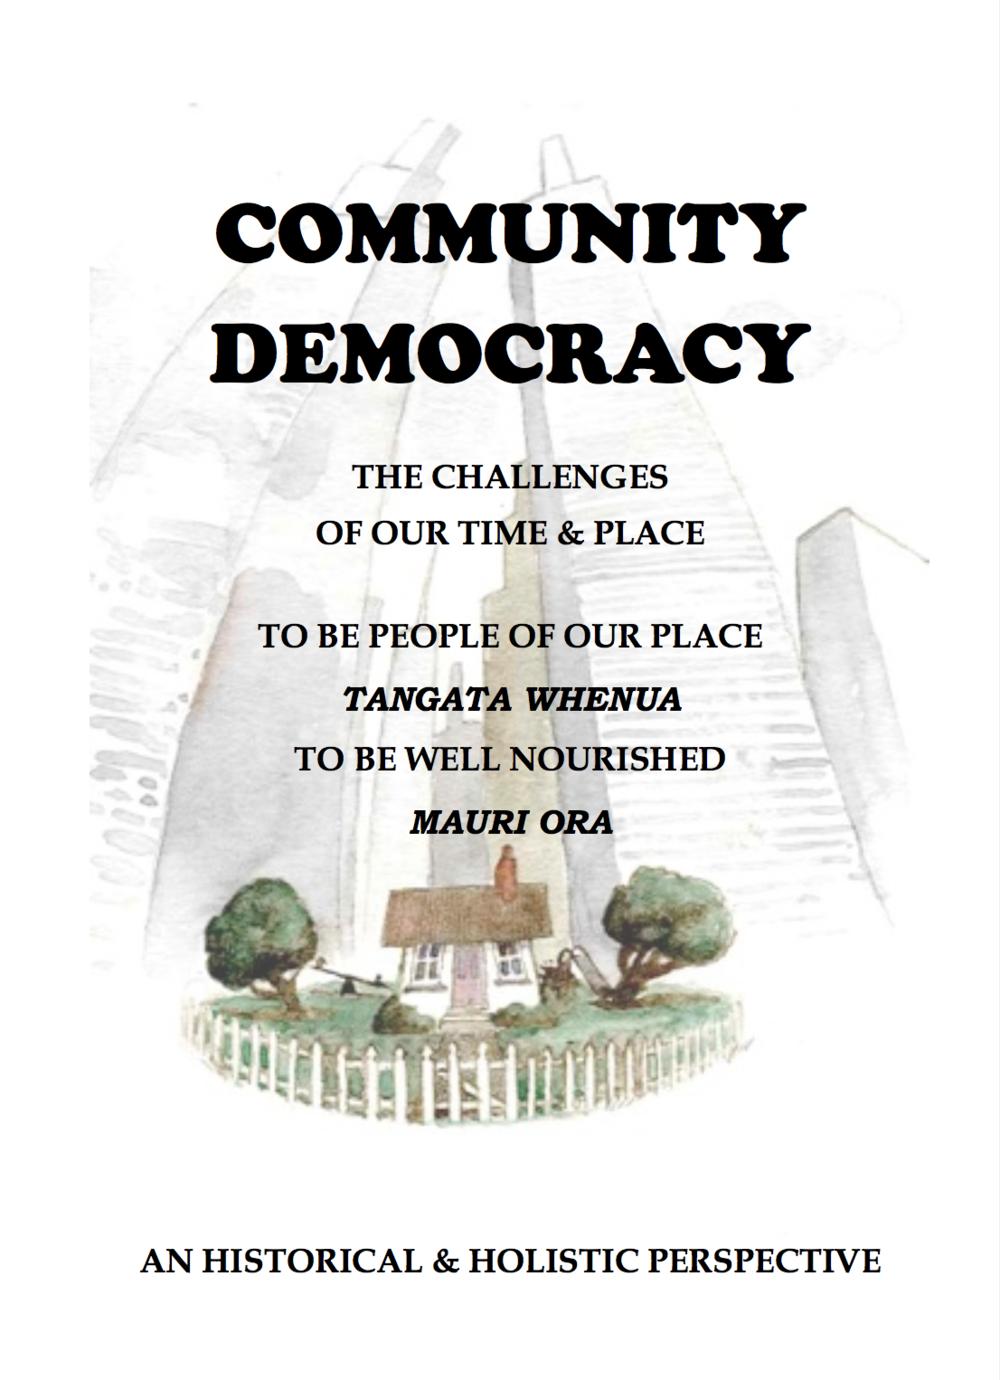 Gary Williams - Community democracy